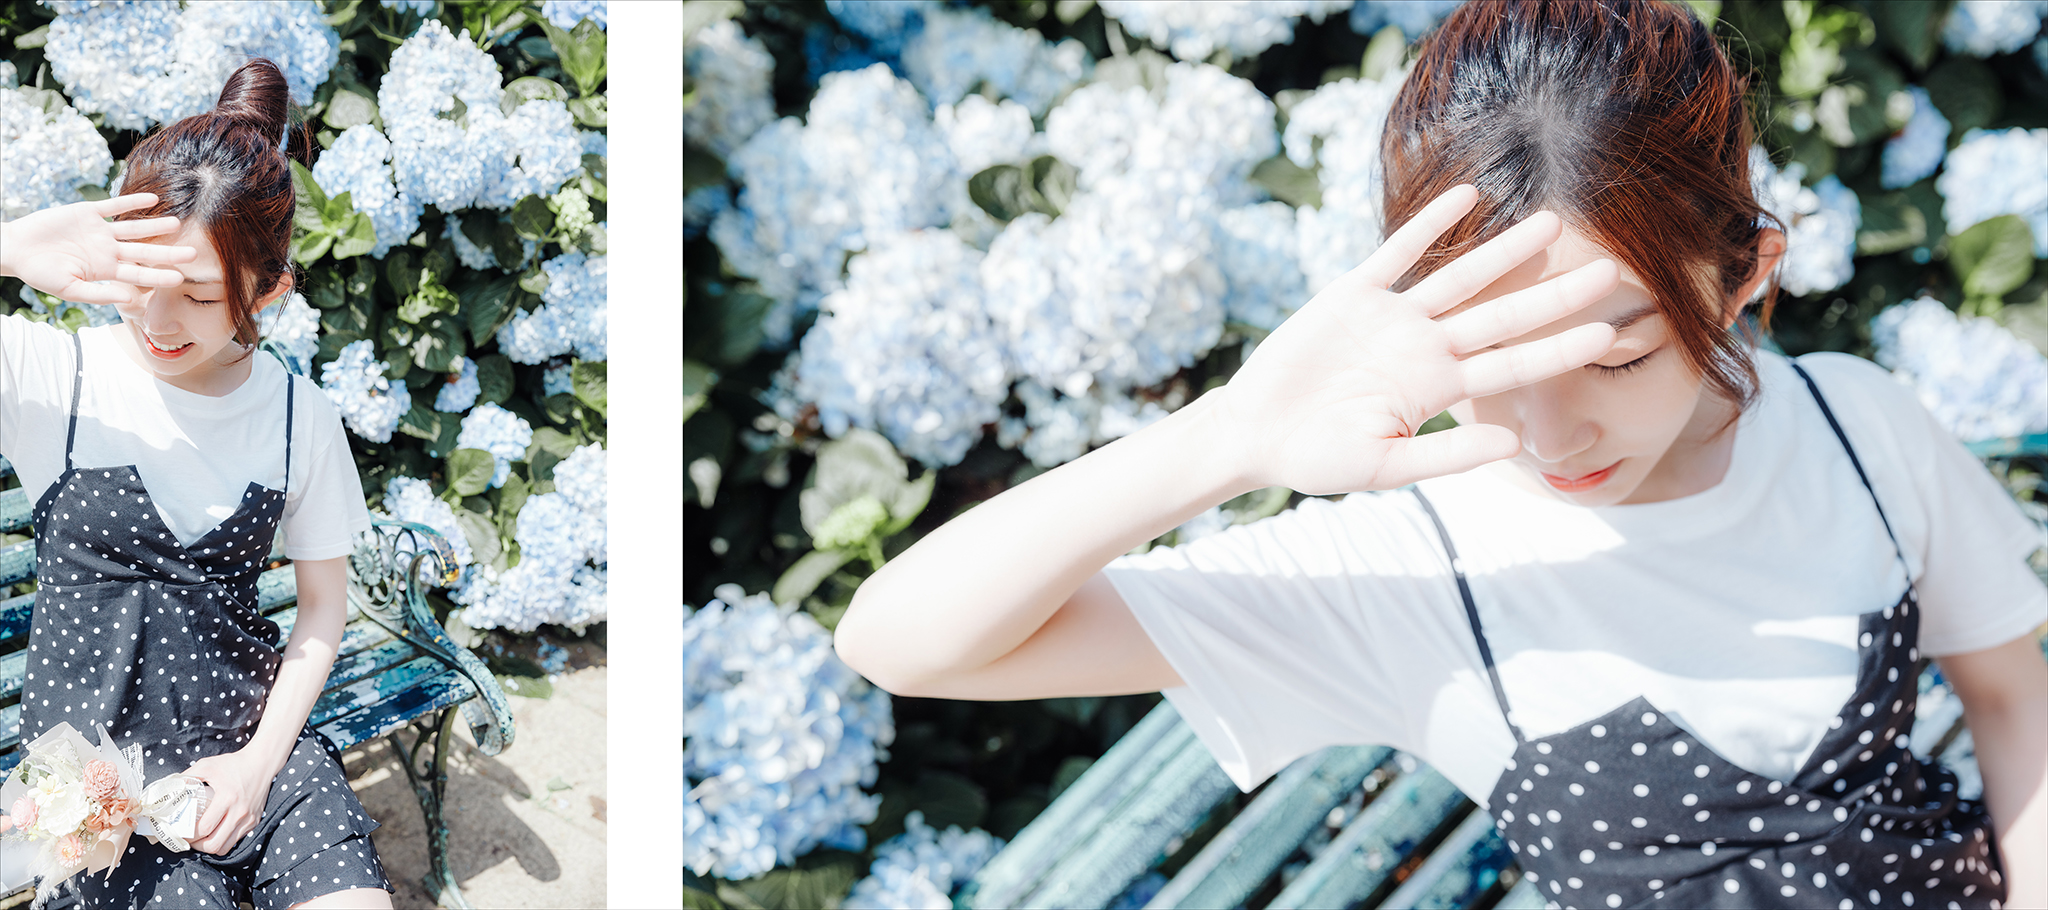 50030513827 5c4f4d2bae o - 【夏季寫真】+Shan+